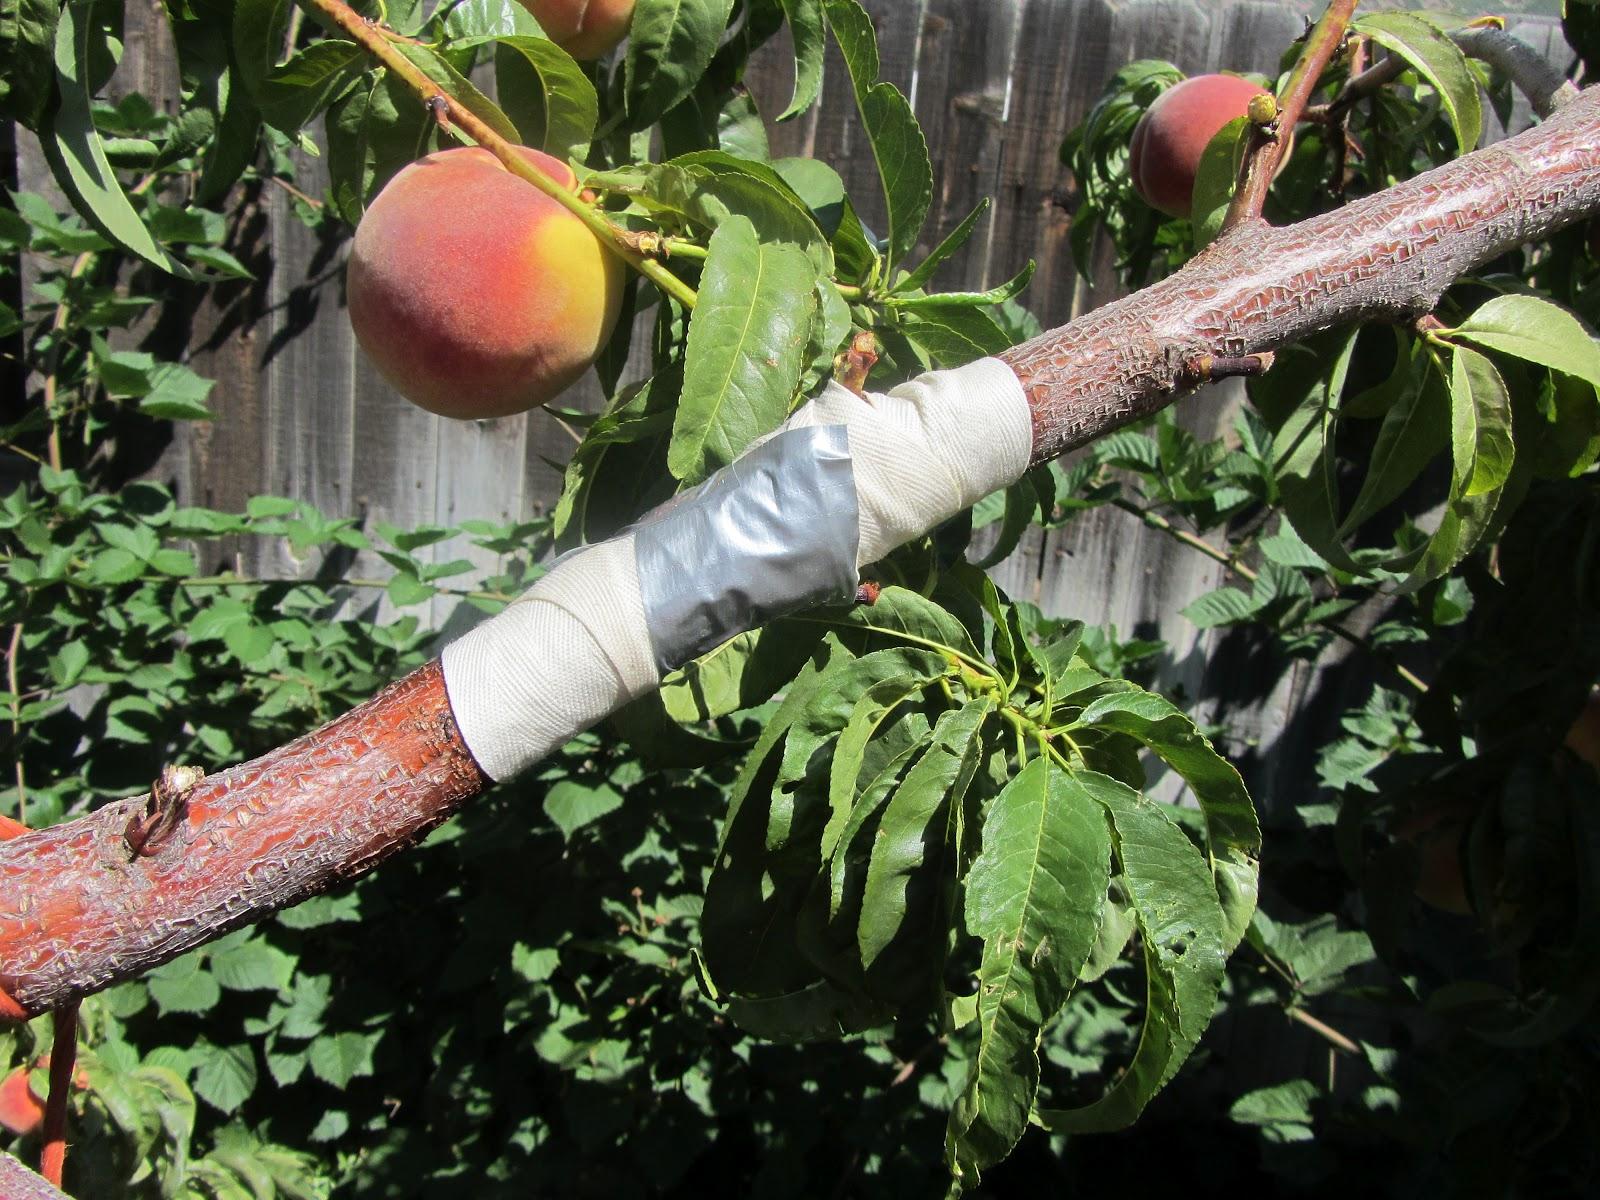 http://2.bp.blogspot.com/-PrZmxlL-sWI/UEECKh6418I/AAAAAAAAD18/QlFrrUZi6-w/s1600/2012,+August+funnies,+peach+tree+013.JPG